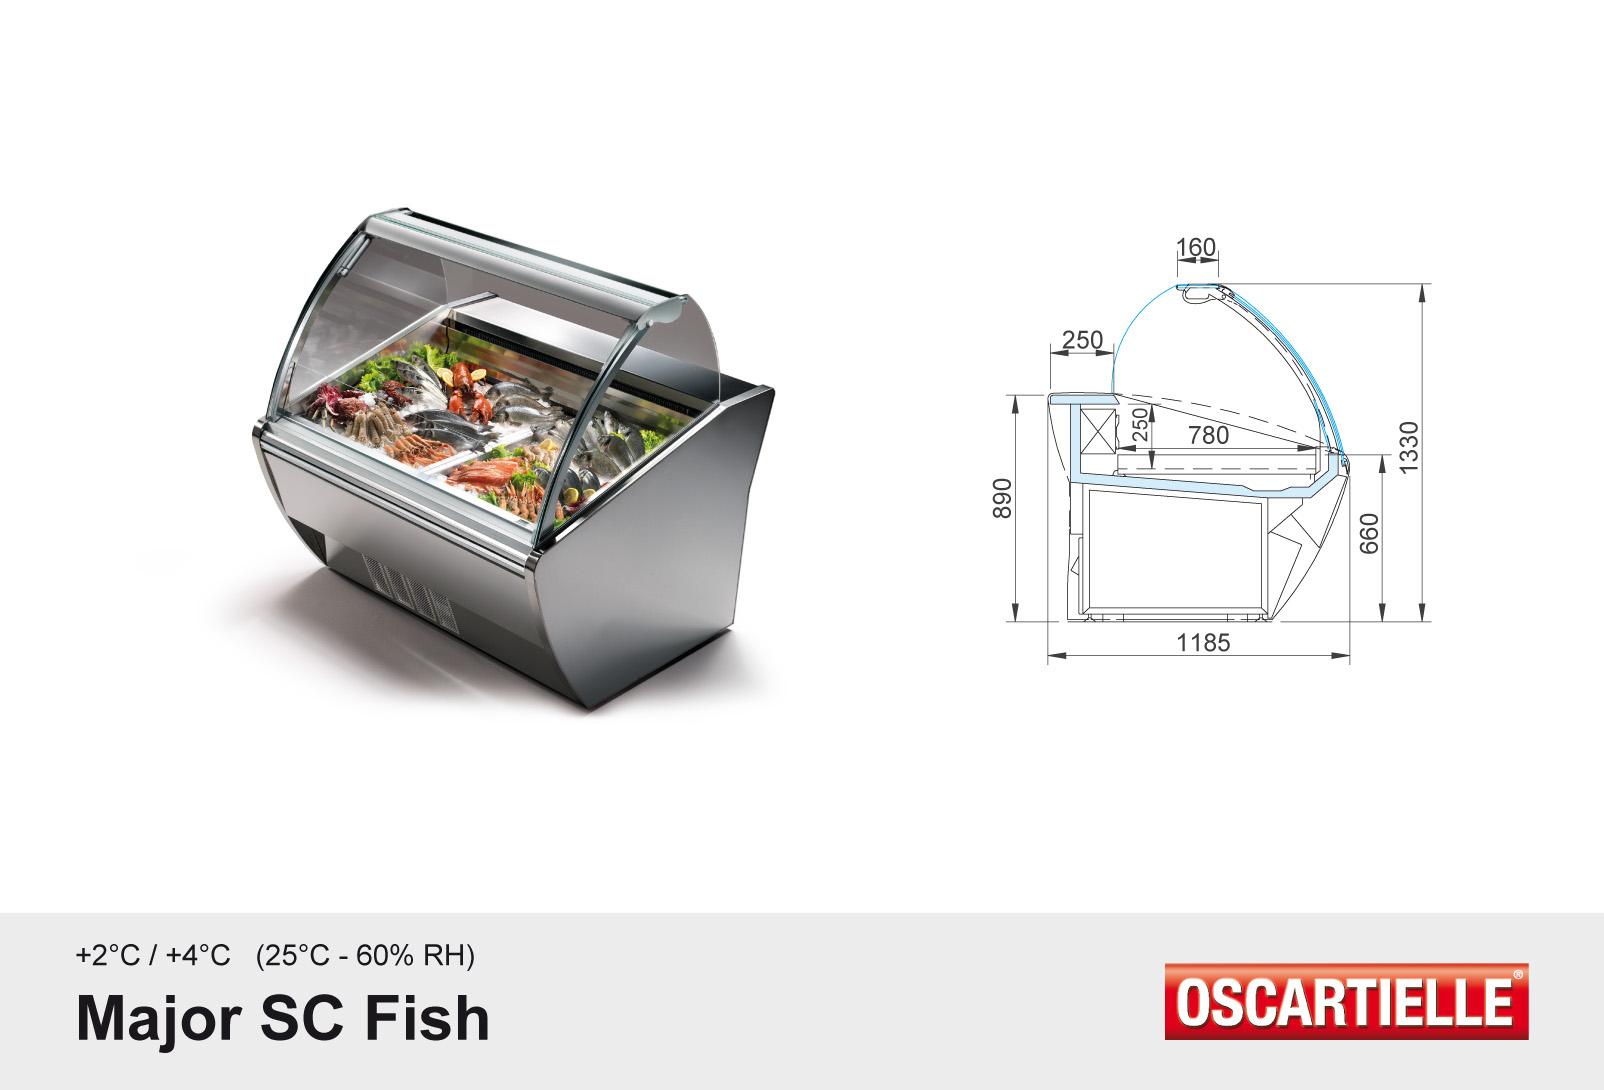 Major SC Fish